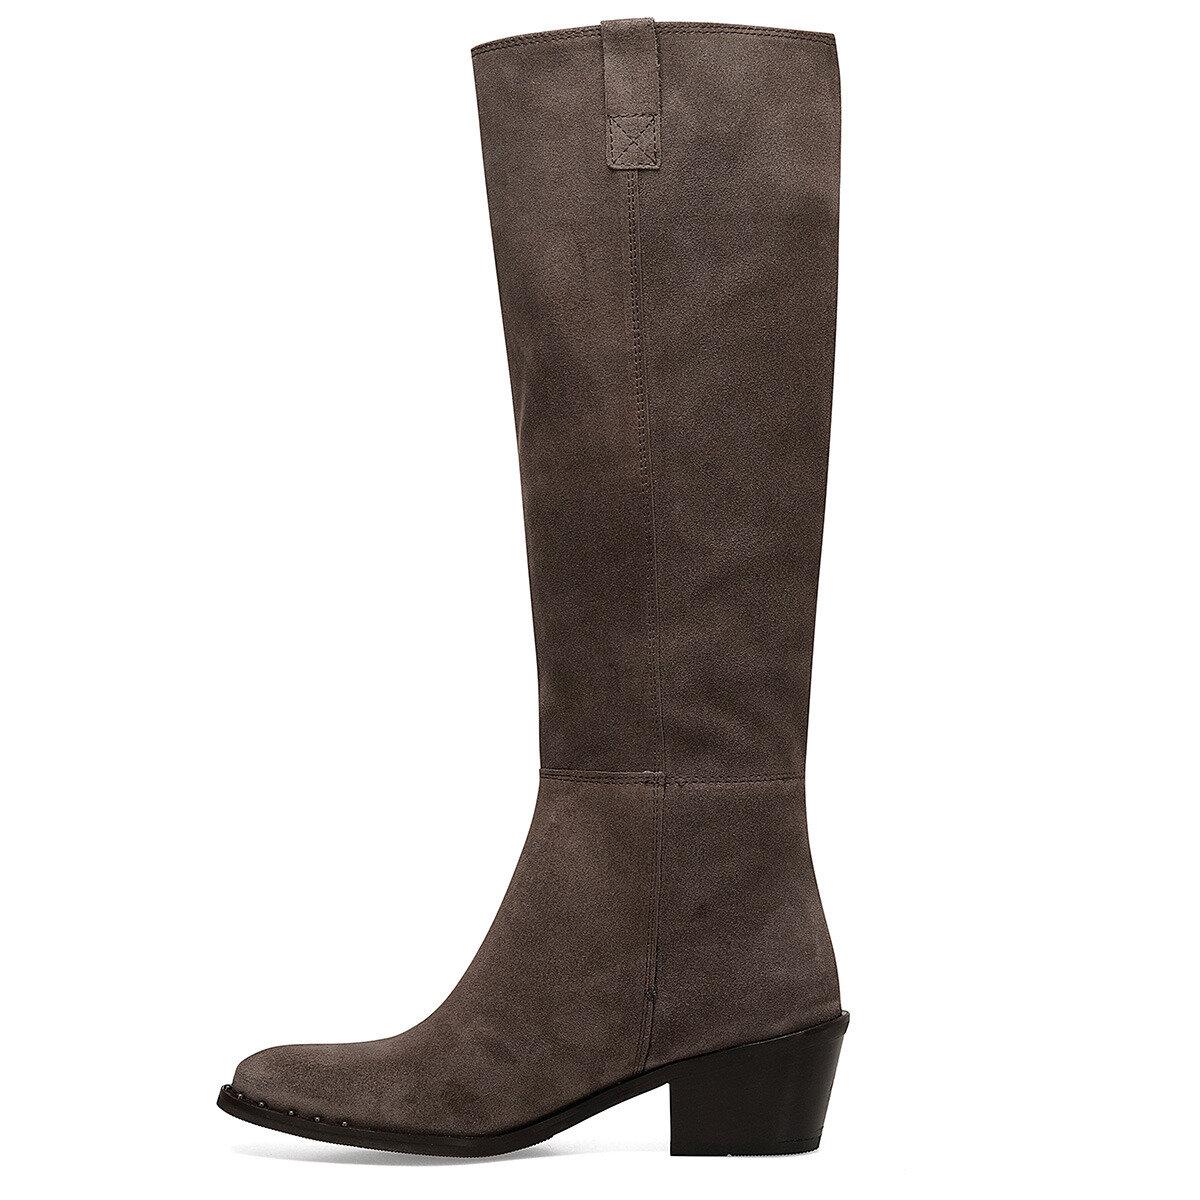 FLINTINA2 Vizon Kadın Çizme